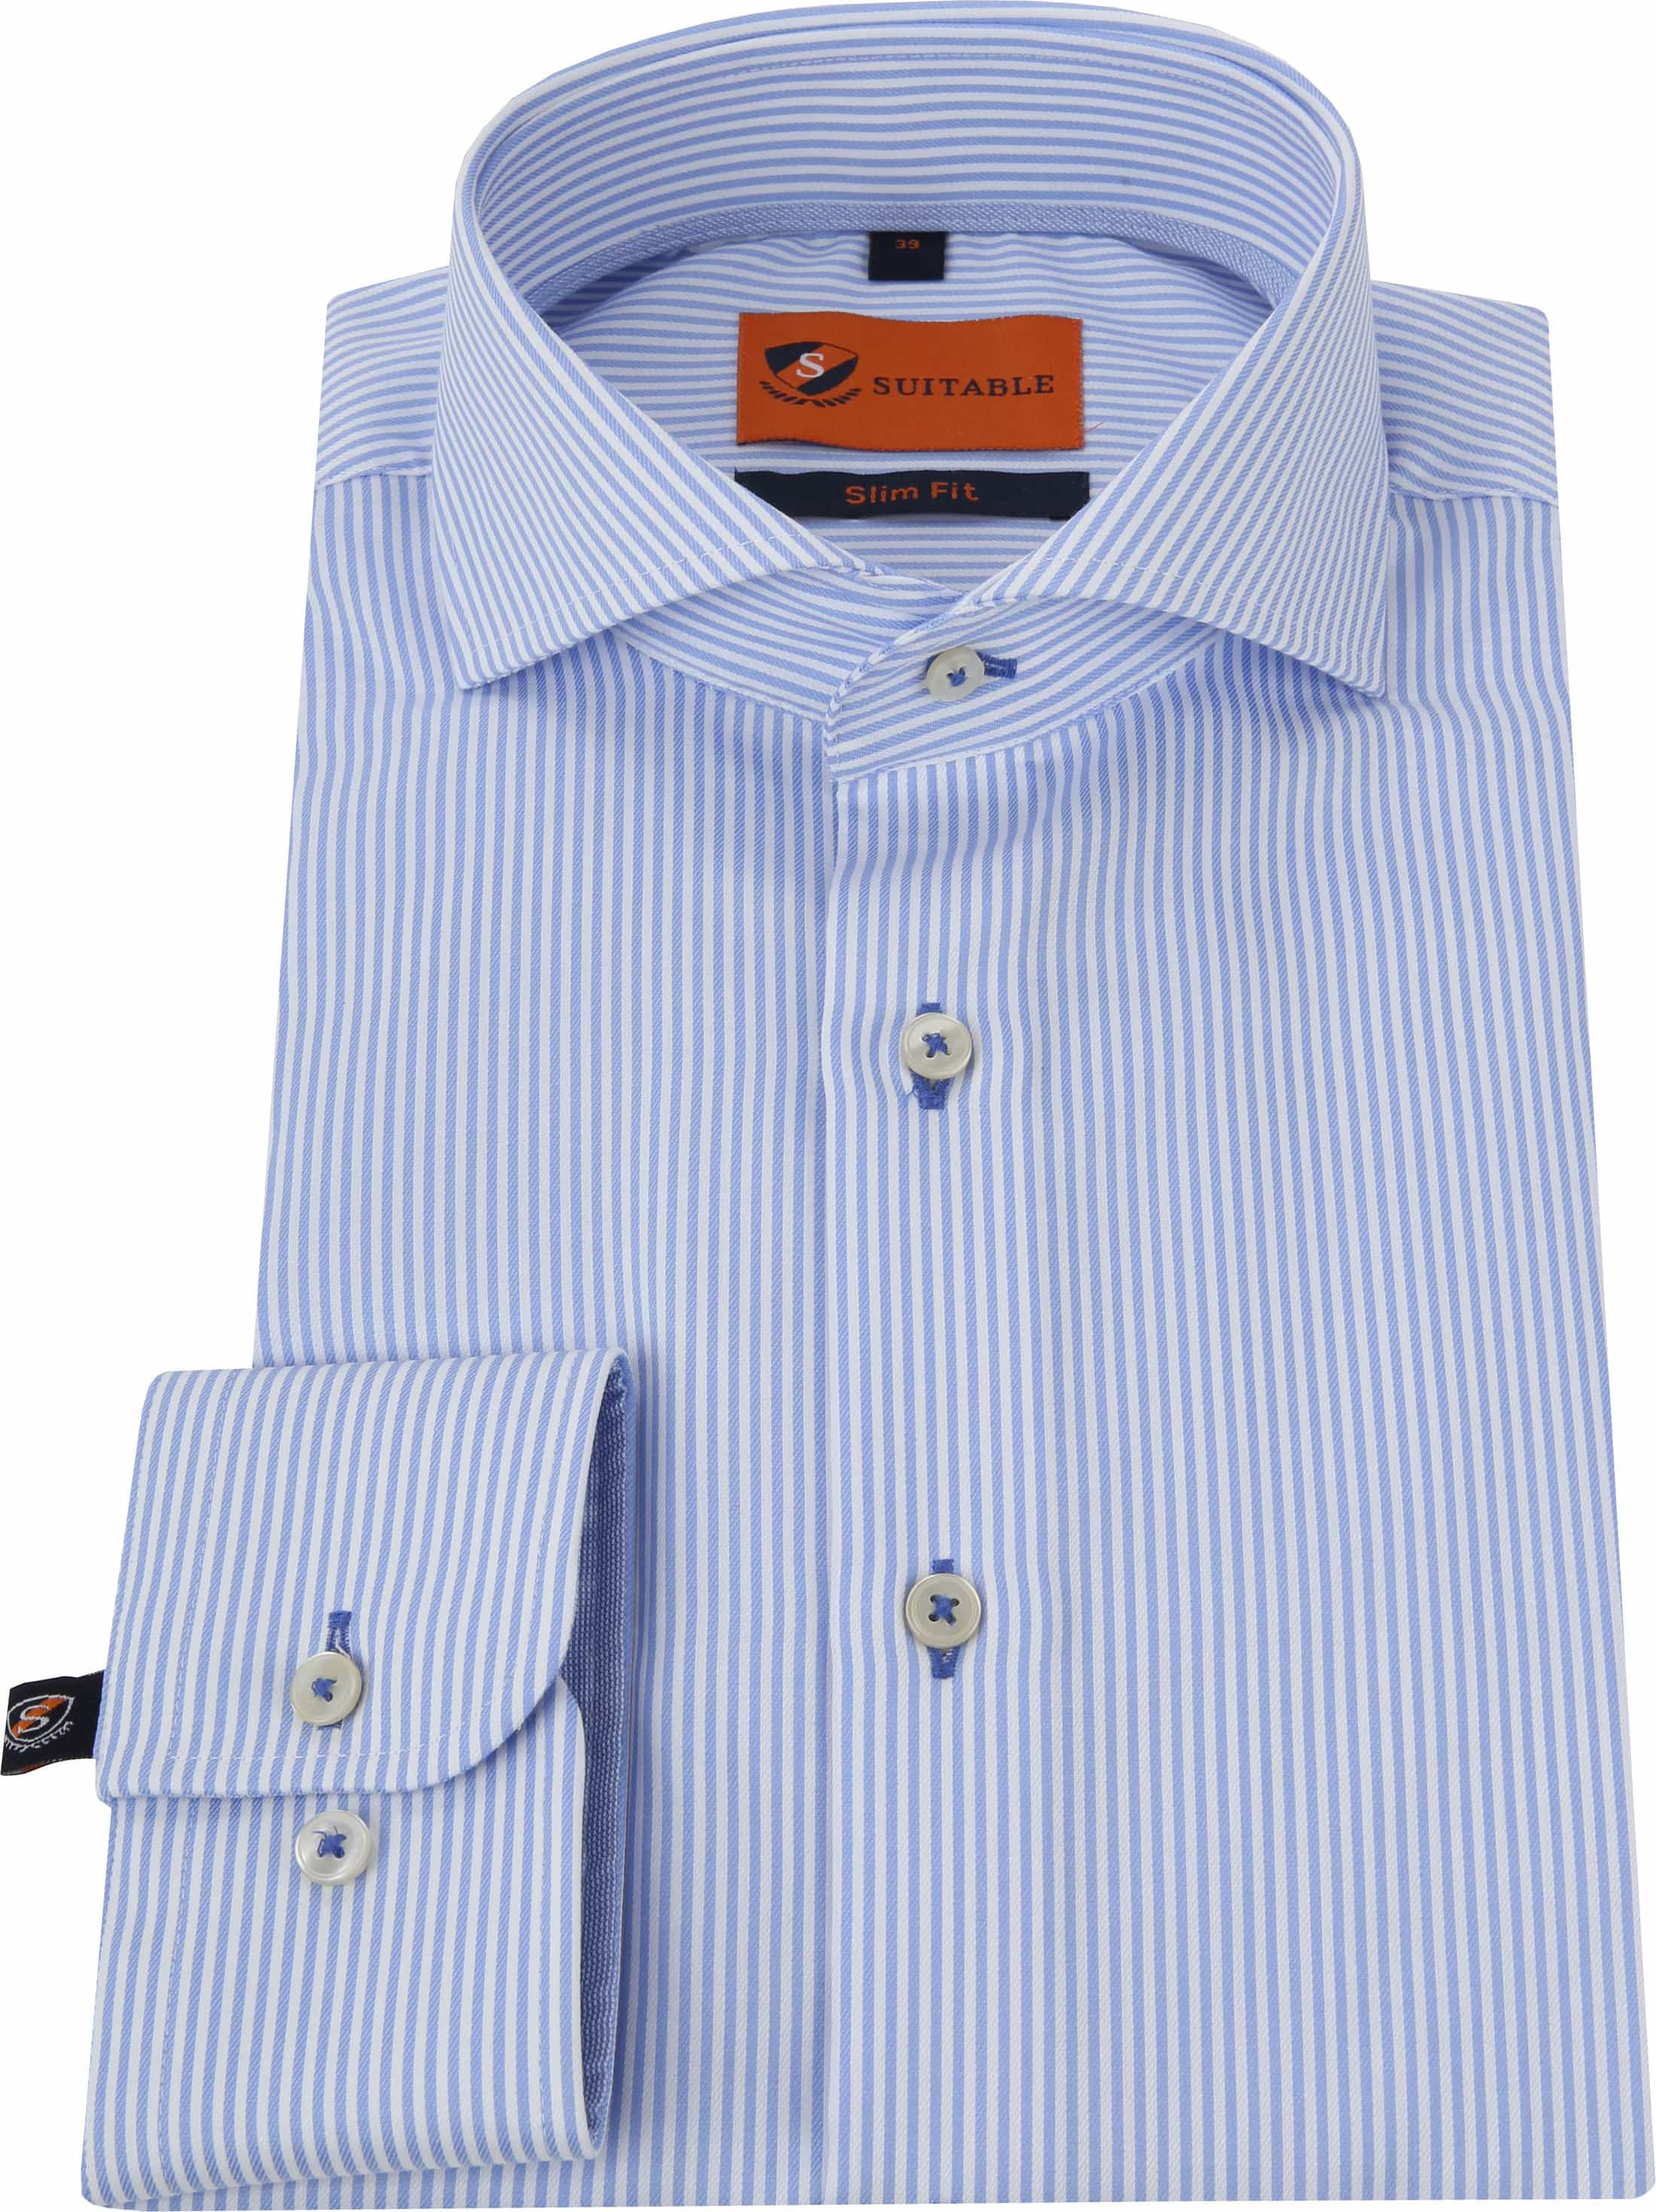 Suitable Hemd Streifen Blau foto 2